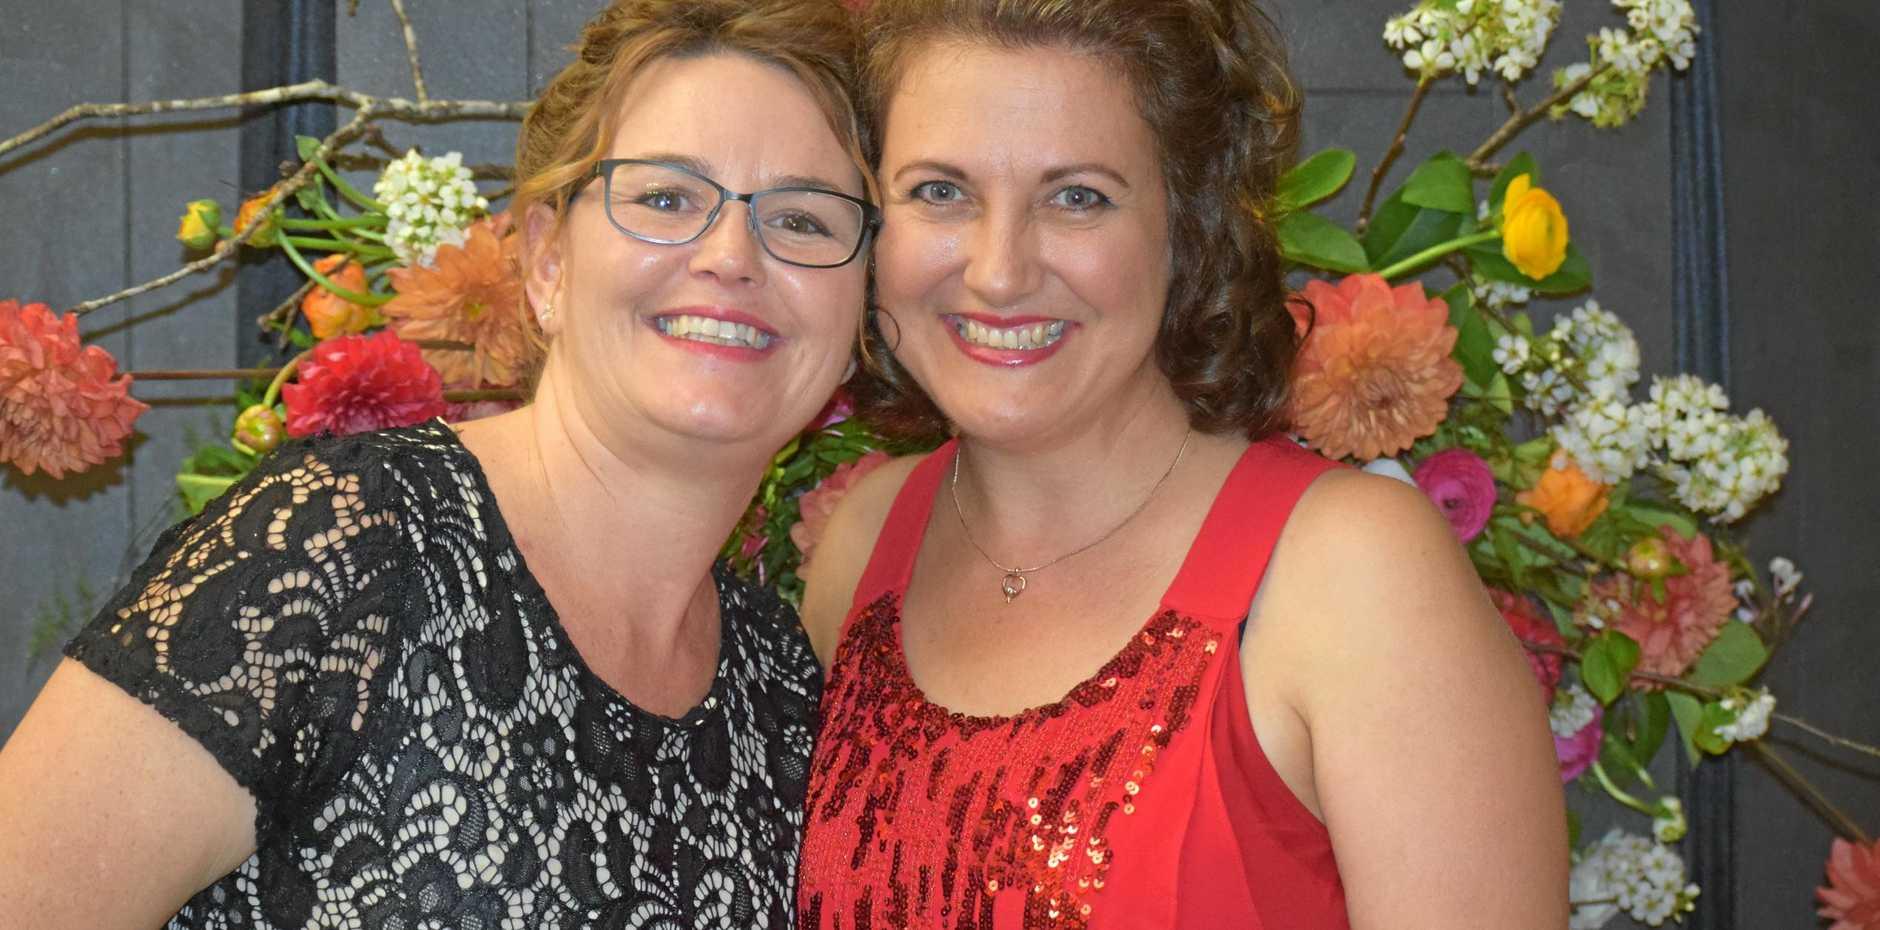 CELEBRATION TIME: Shelley Grambower and Gina Moore enjoyed the 2018 Business Awards on Saturday night.